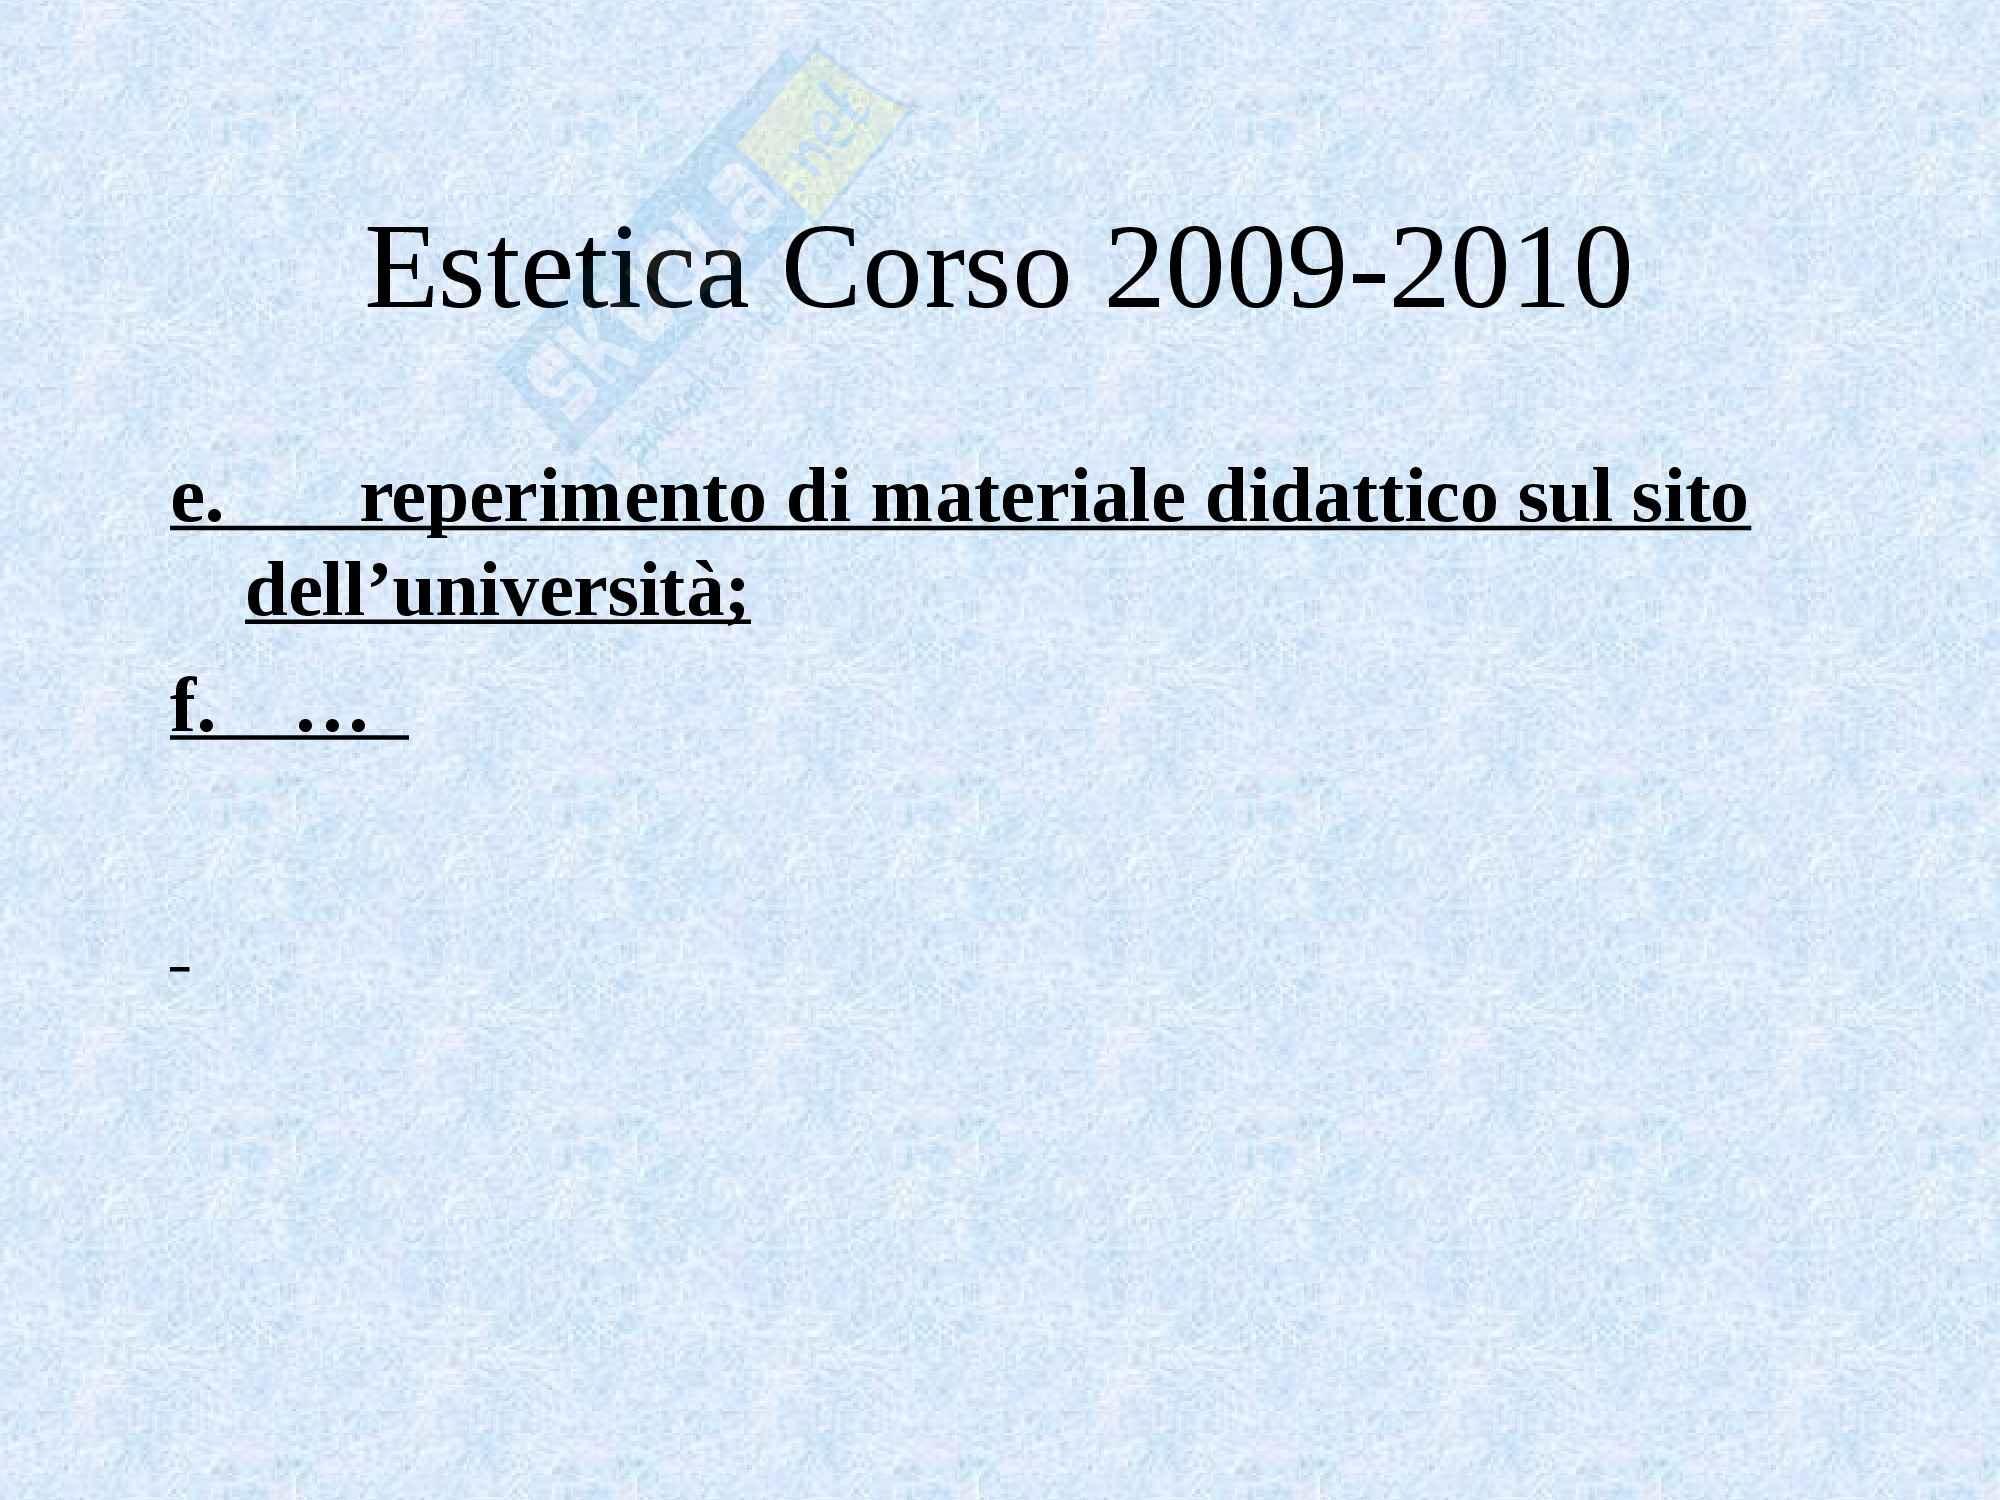 Estetica - lo studio dell'estetica Pag. 6